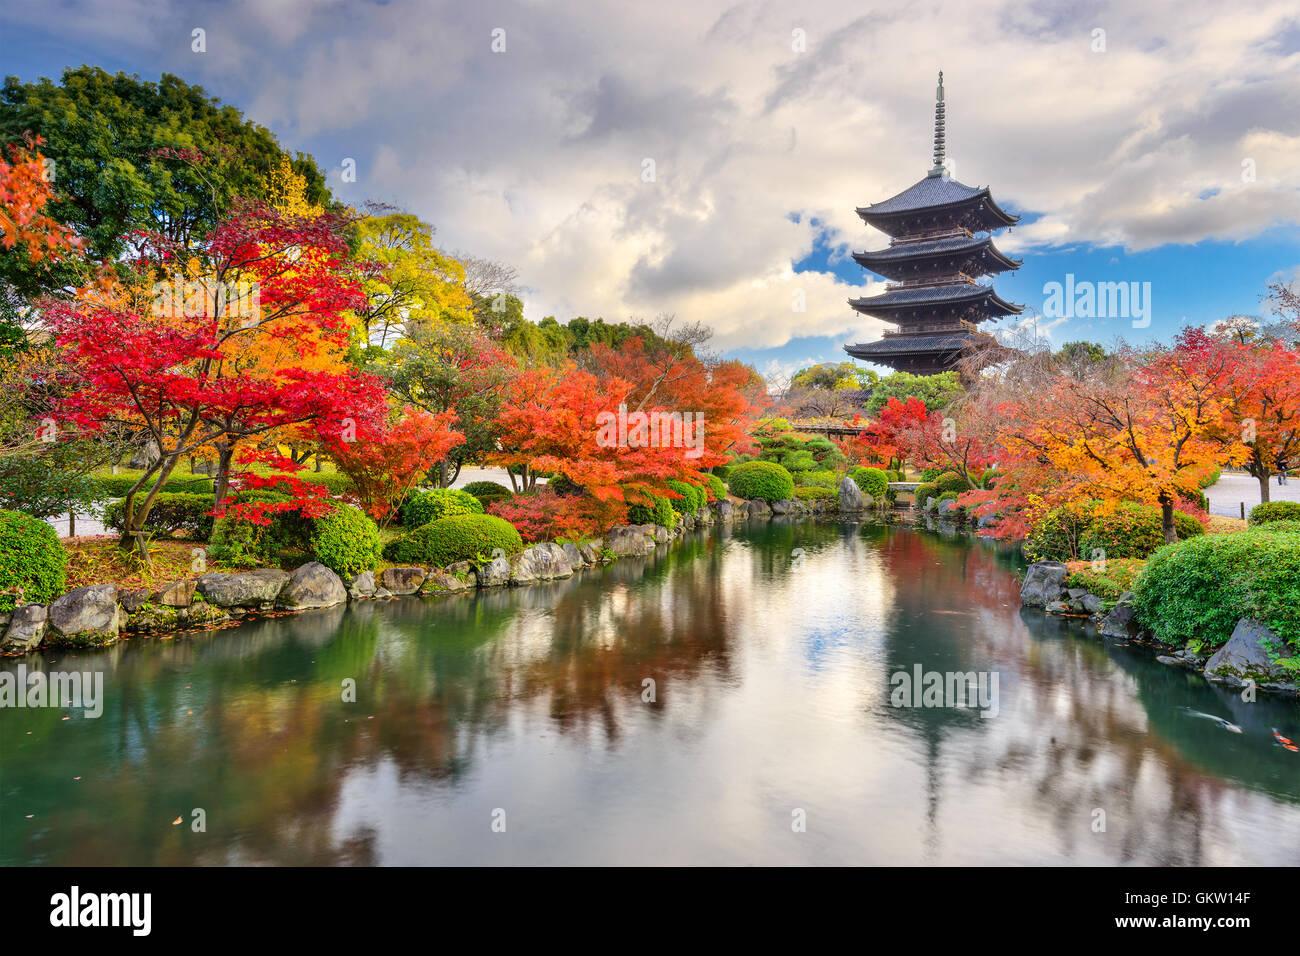 Kyoto, Japan at Toji Pagoda in Autumn. - Stock Image